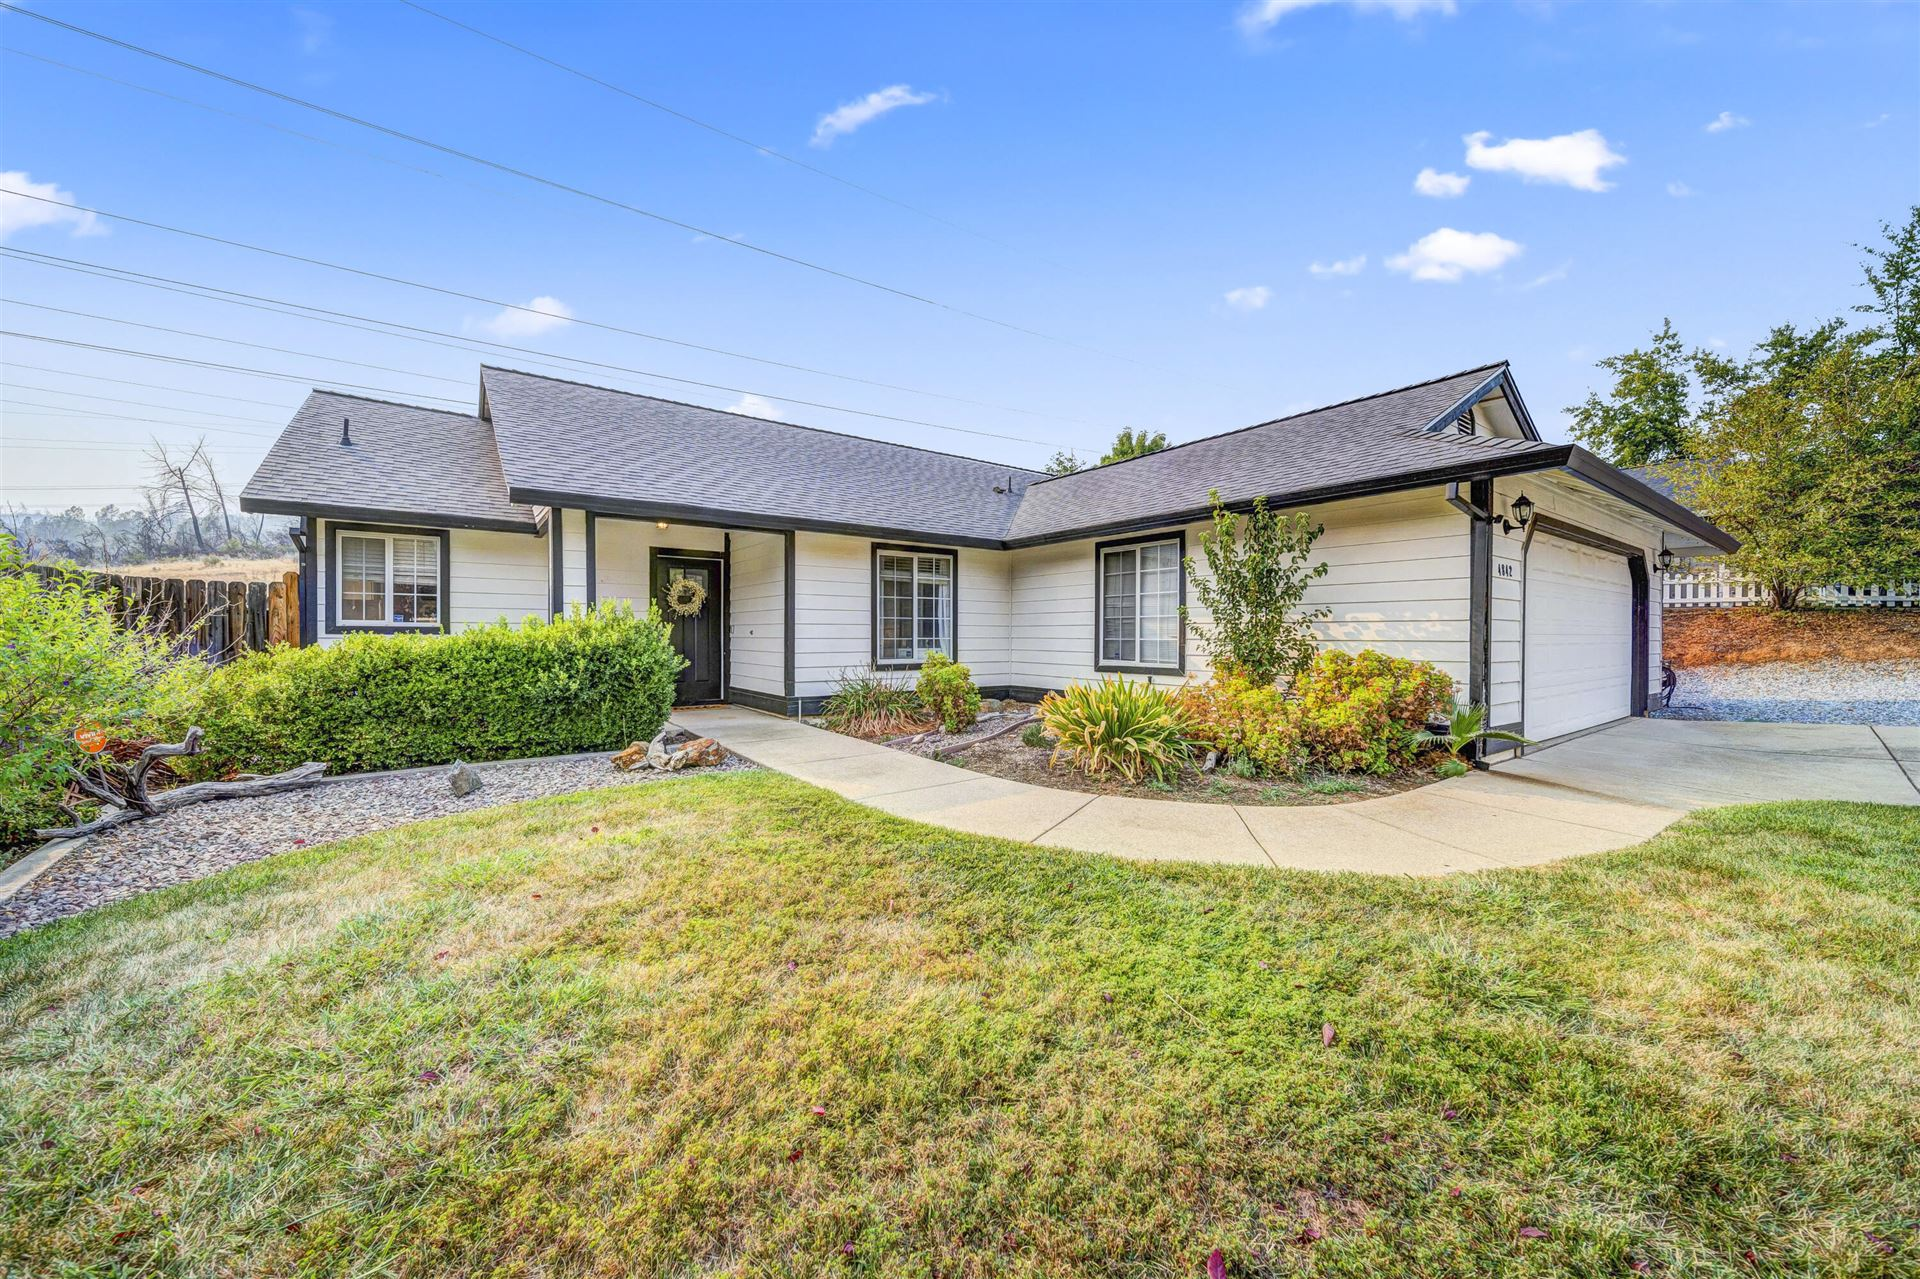 Photo of 4842 Tralee Ln, Redding, CA 96001 (MLS # 21-4766)